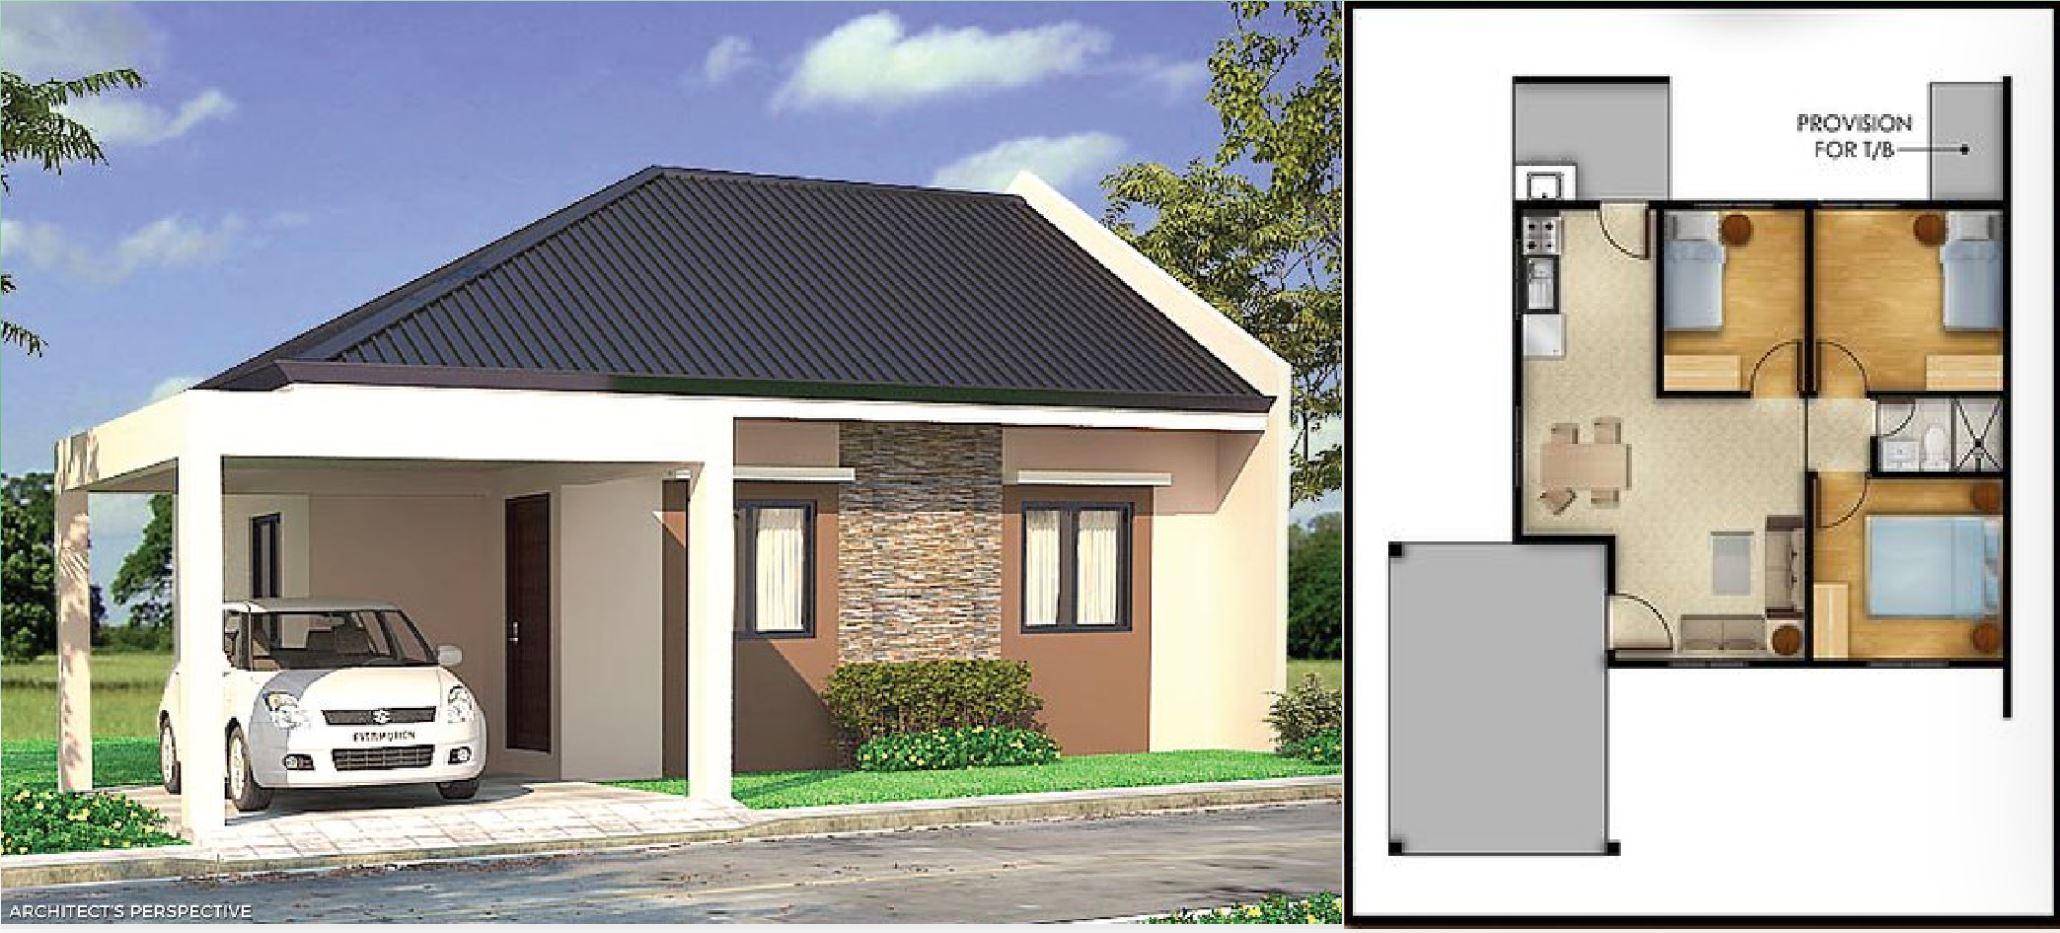 Onyx House model a modern contemporary filipino house design